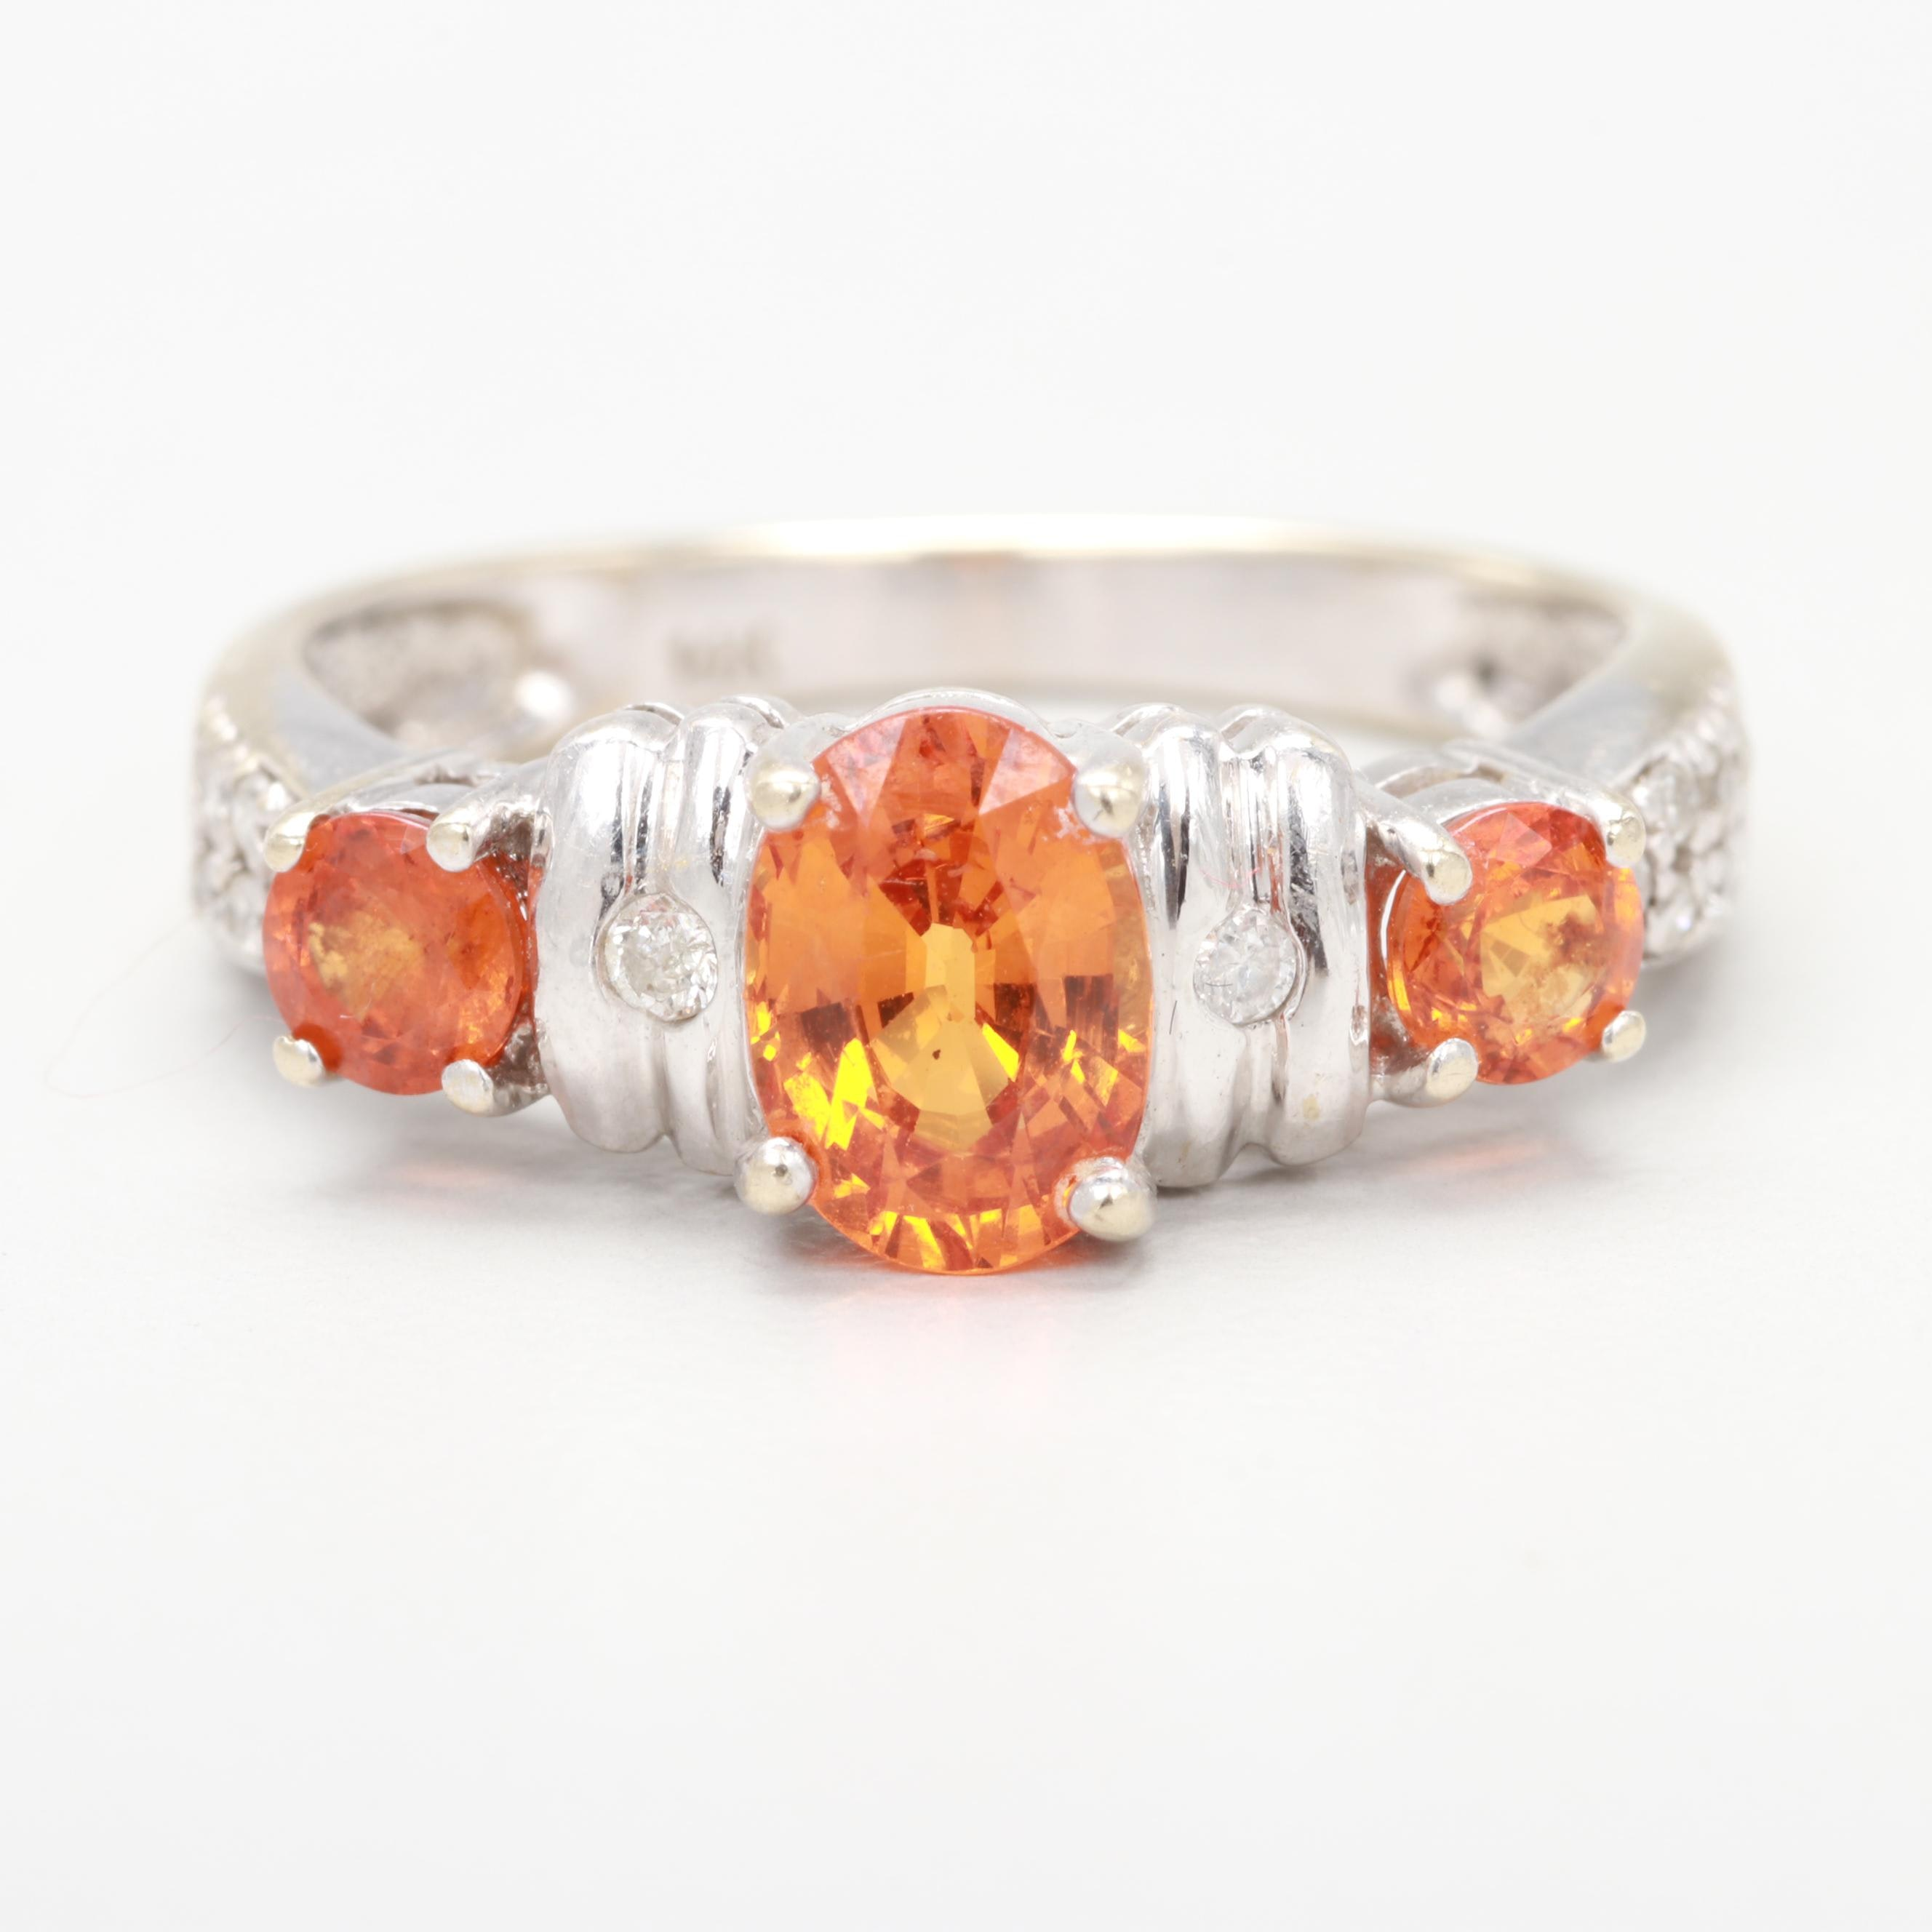 14K White Gold Spessartine Garnet and Diamond Ring